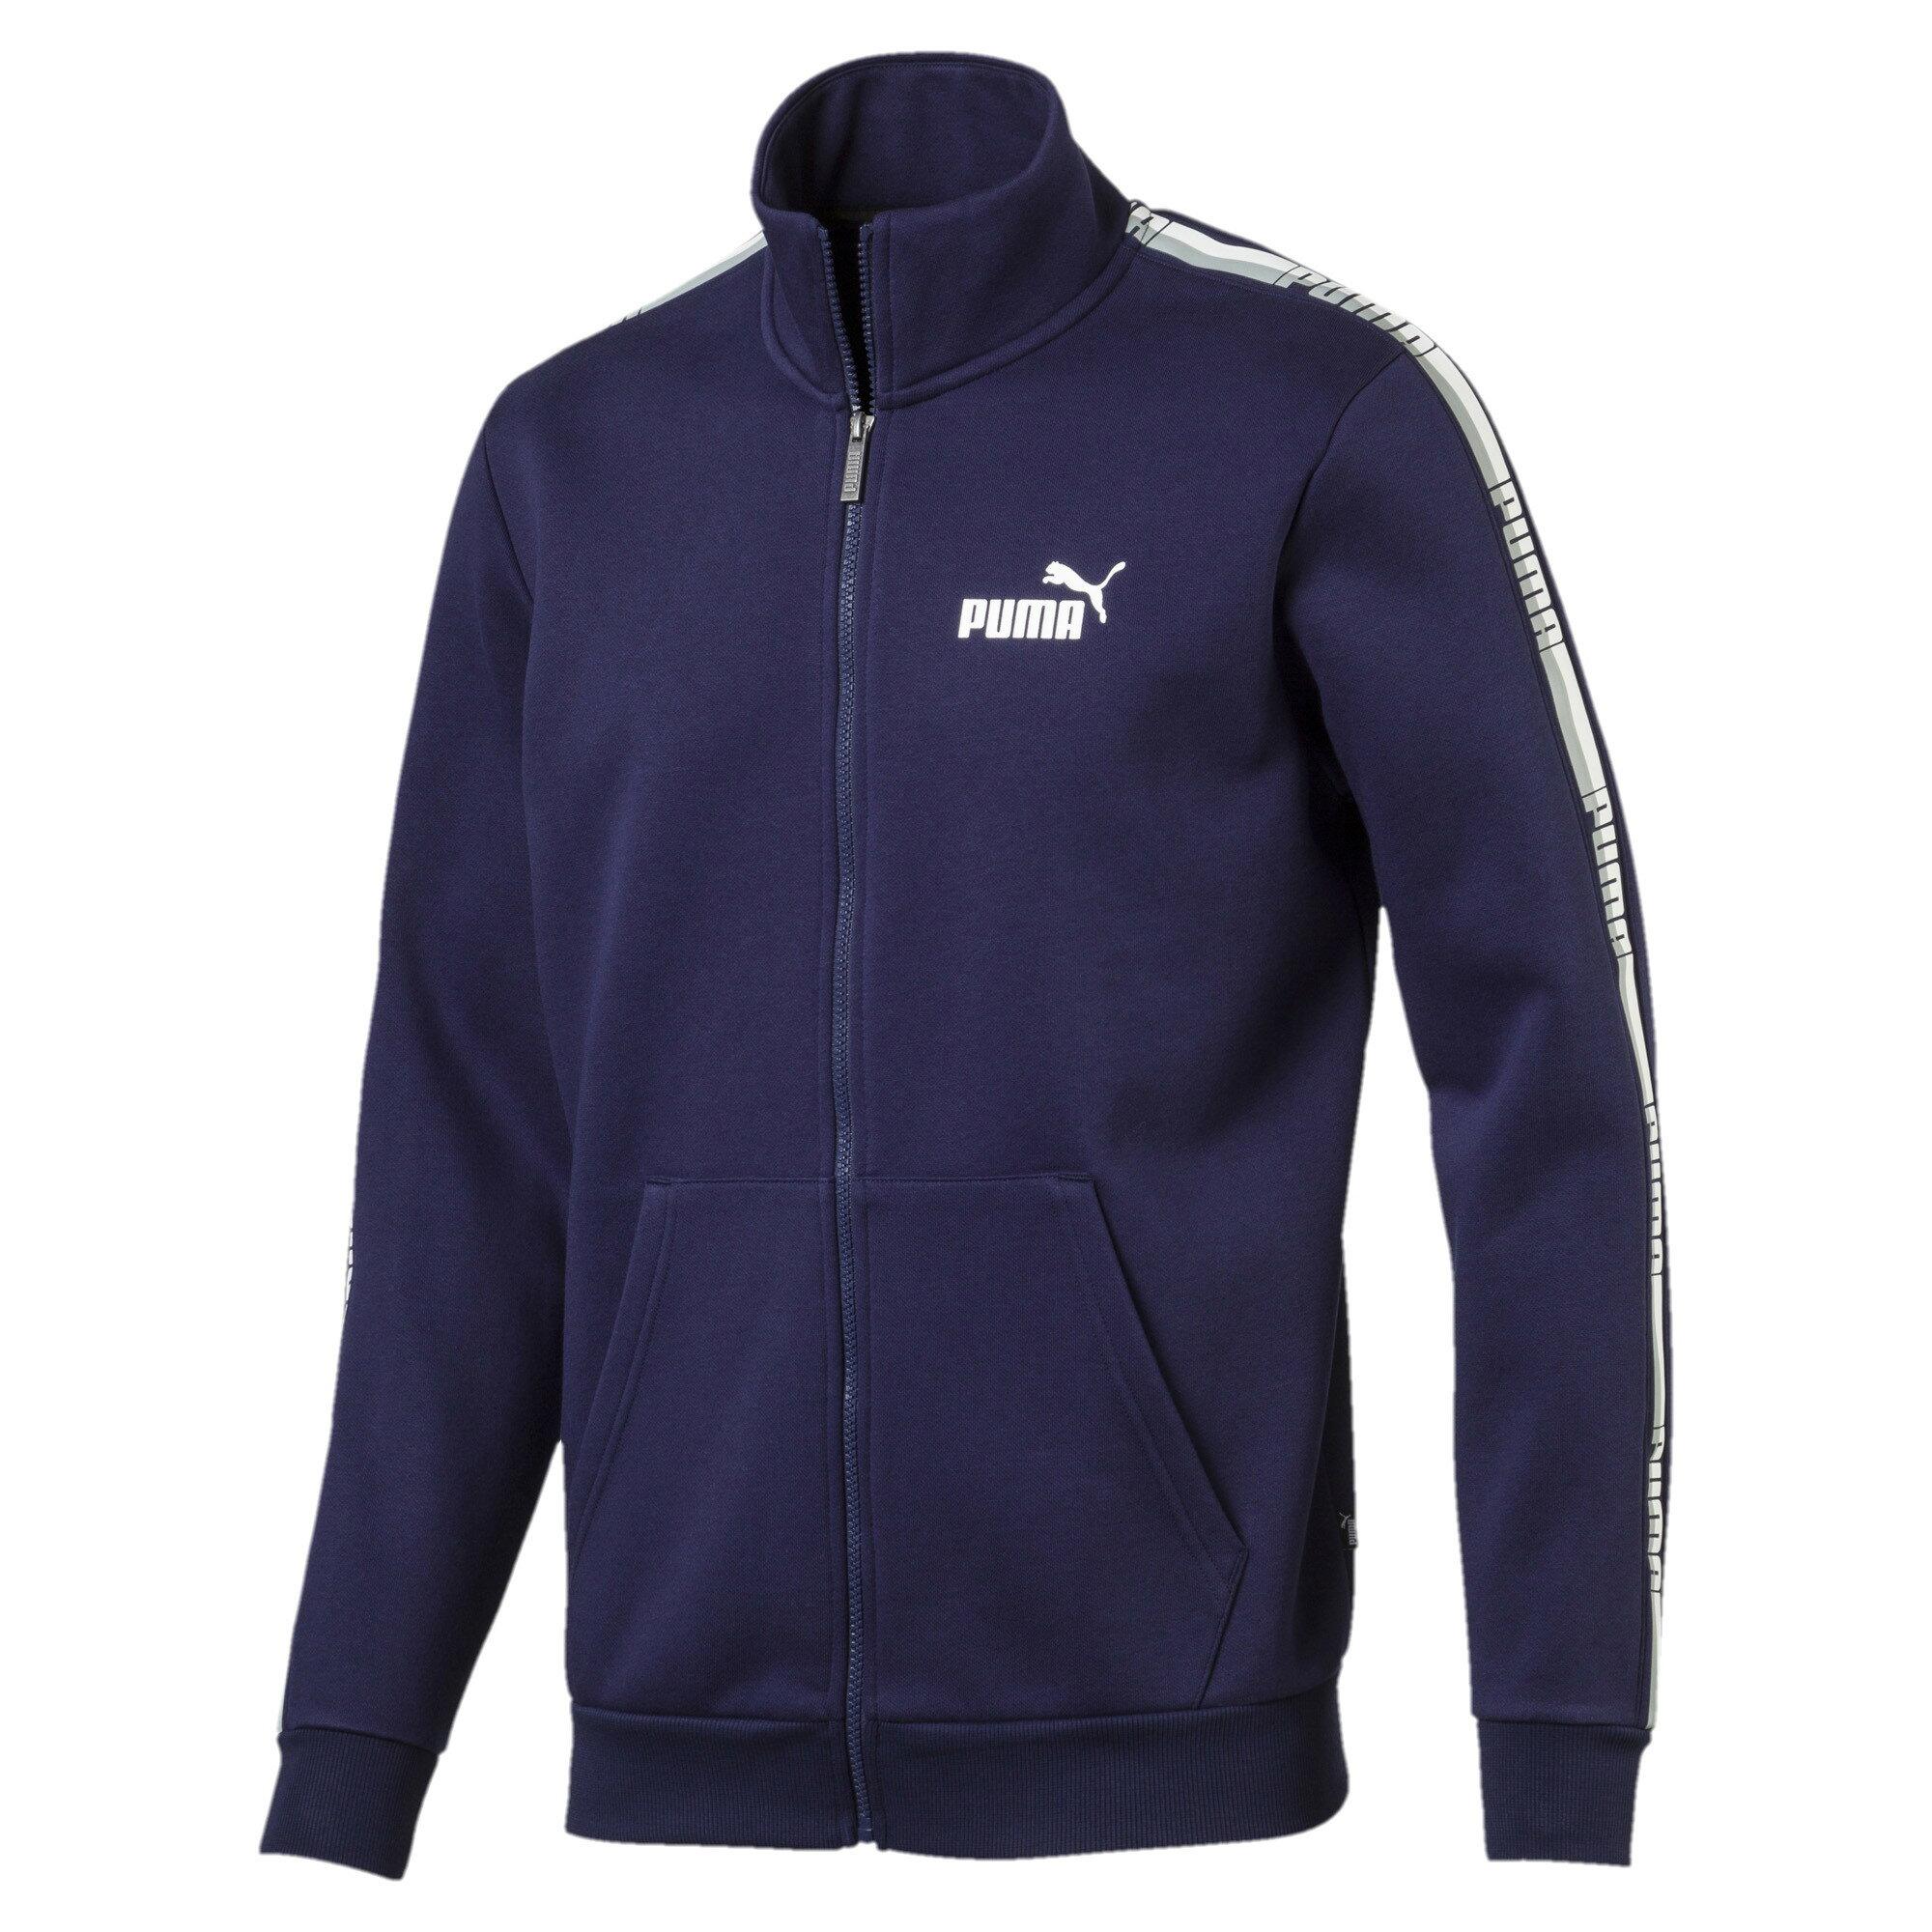 3efe55bfb2fa Official Puma Store  PUMA Tape Men s Track Jacket